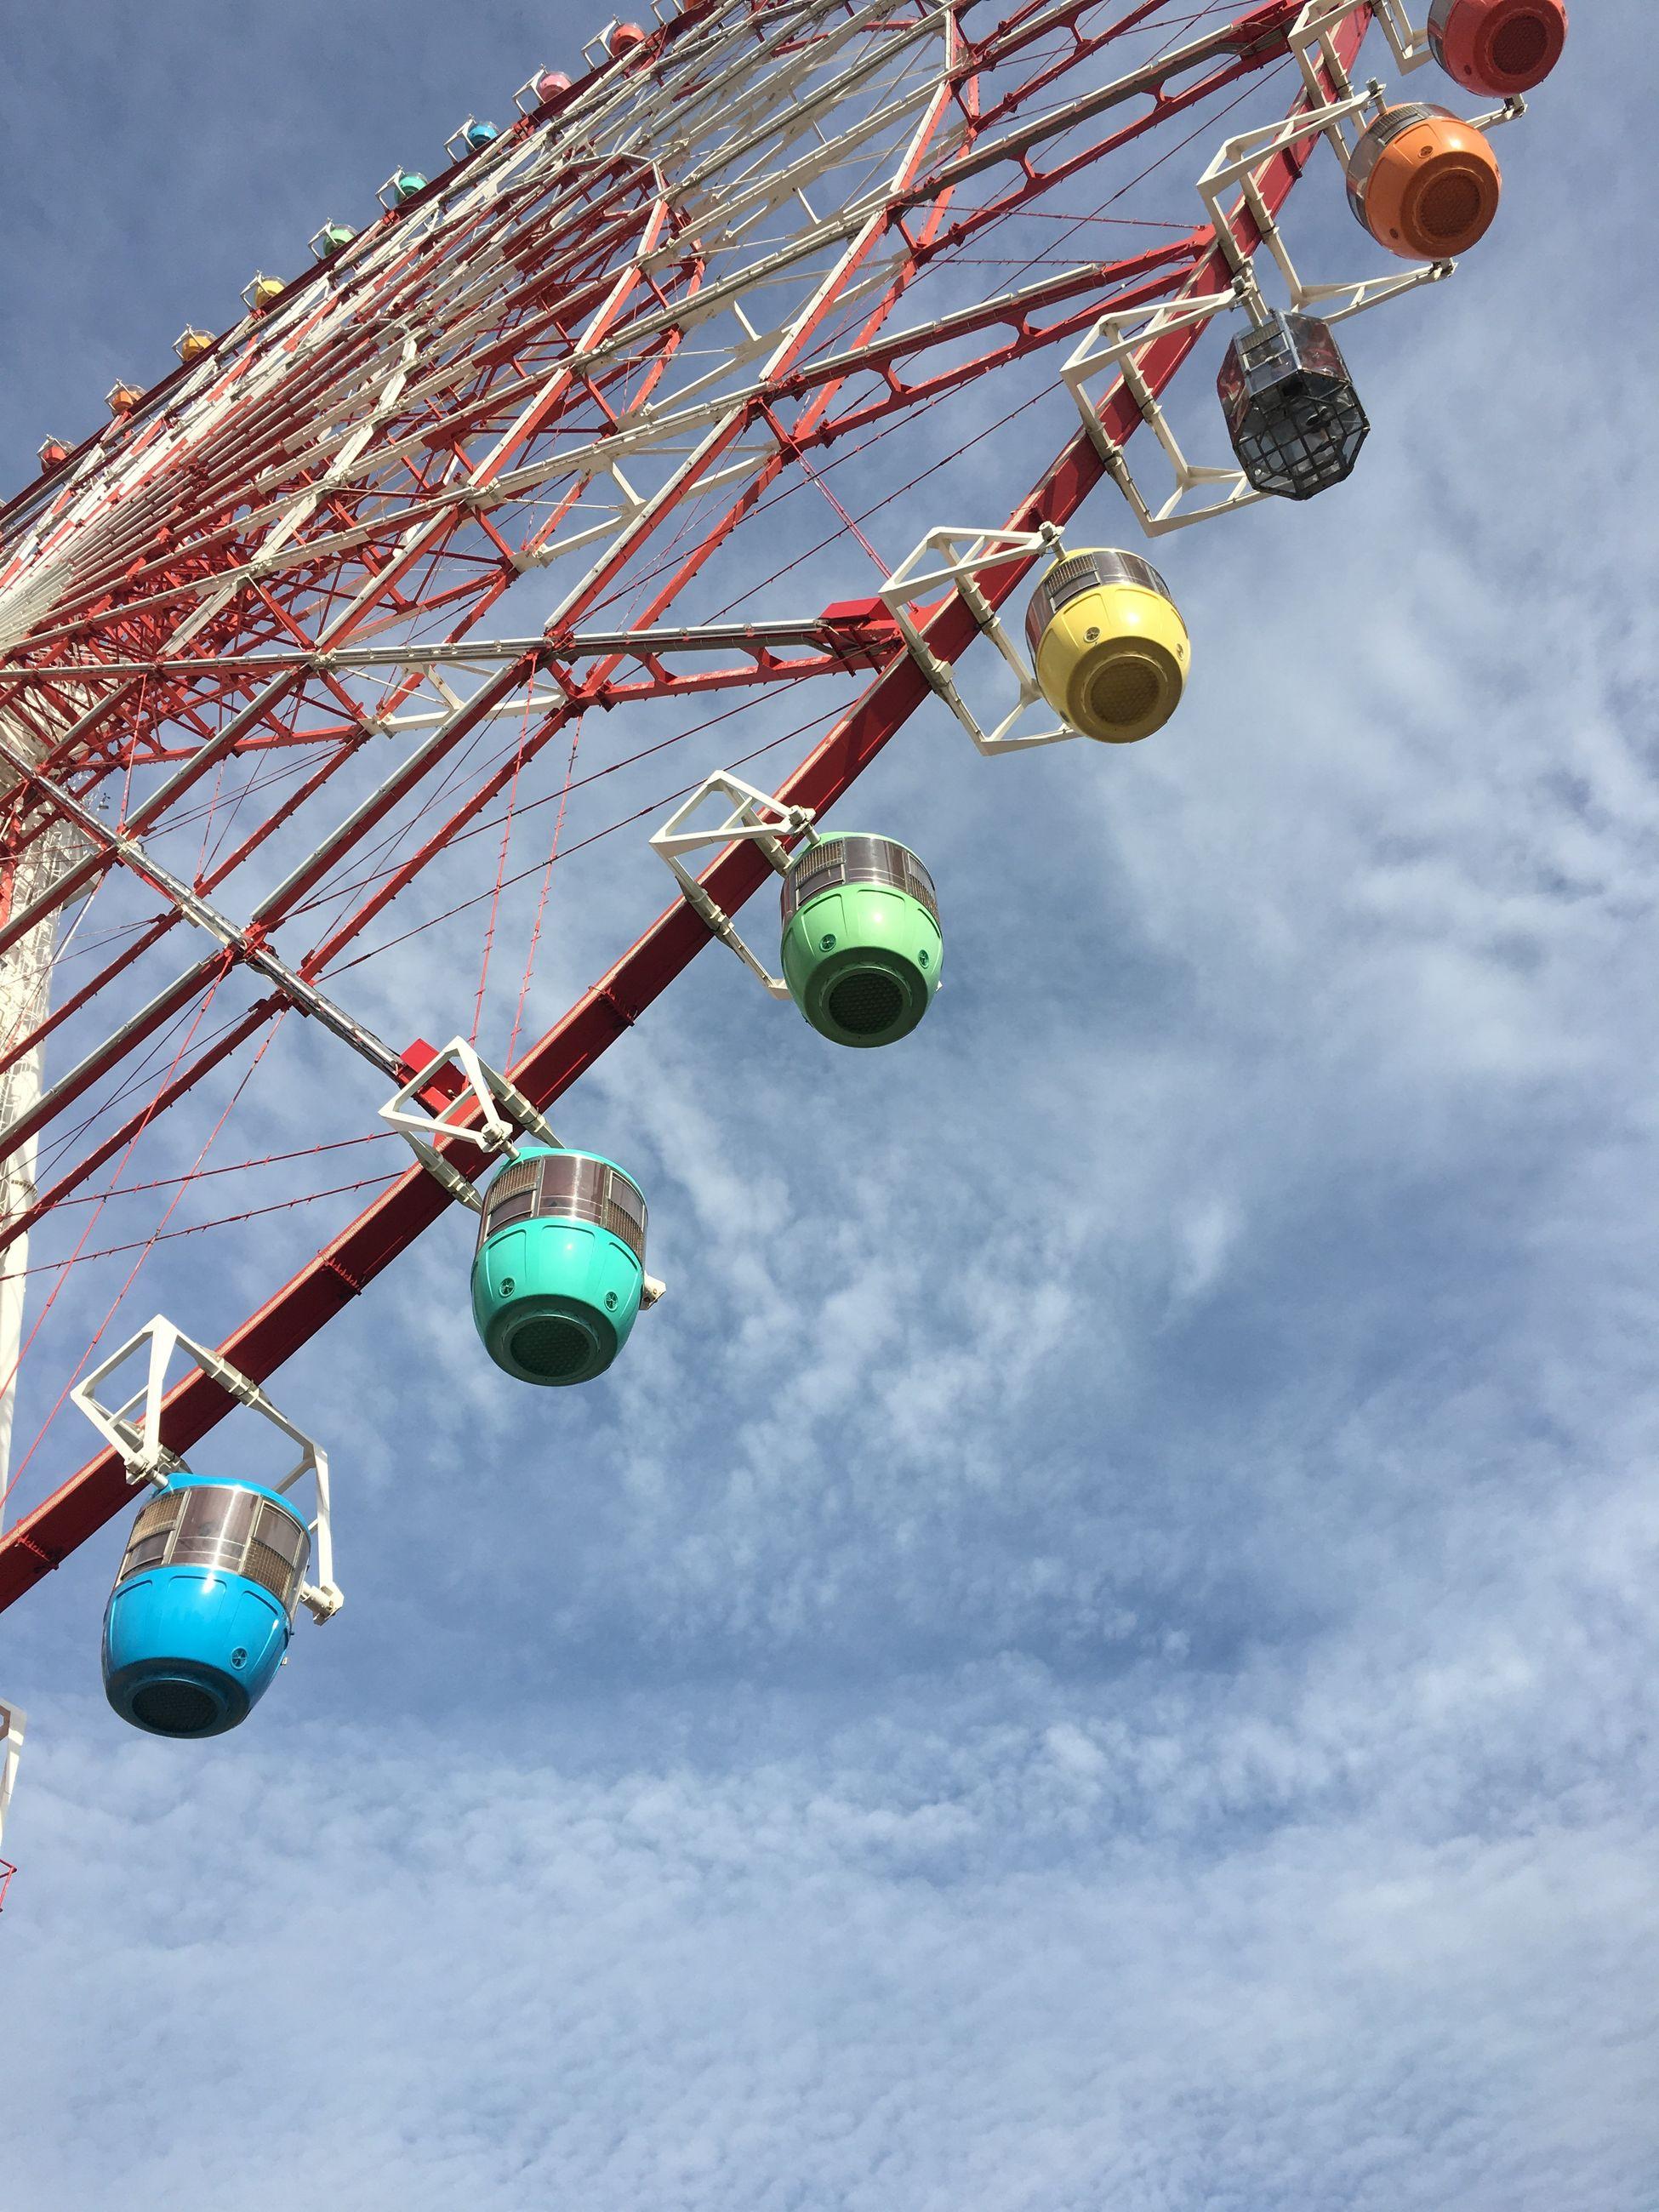 low angle view, sky, amusement park, amusement park ride, arts culture and entertainment, cloud - sky, nature, day, ferris wheel, outdoors, enjoyment, no people, fun, fairground, leisure activity, hanging, multi colored, carnival, metal, decoration, excitement